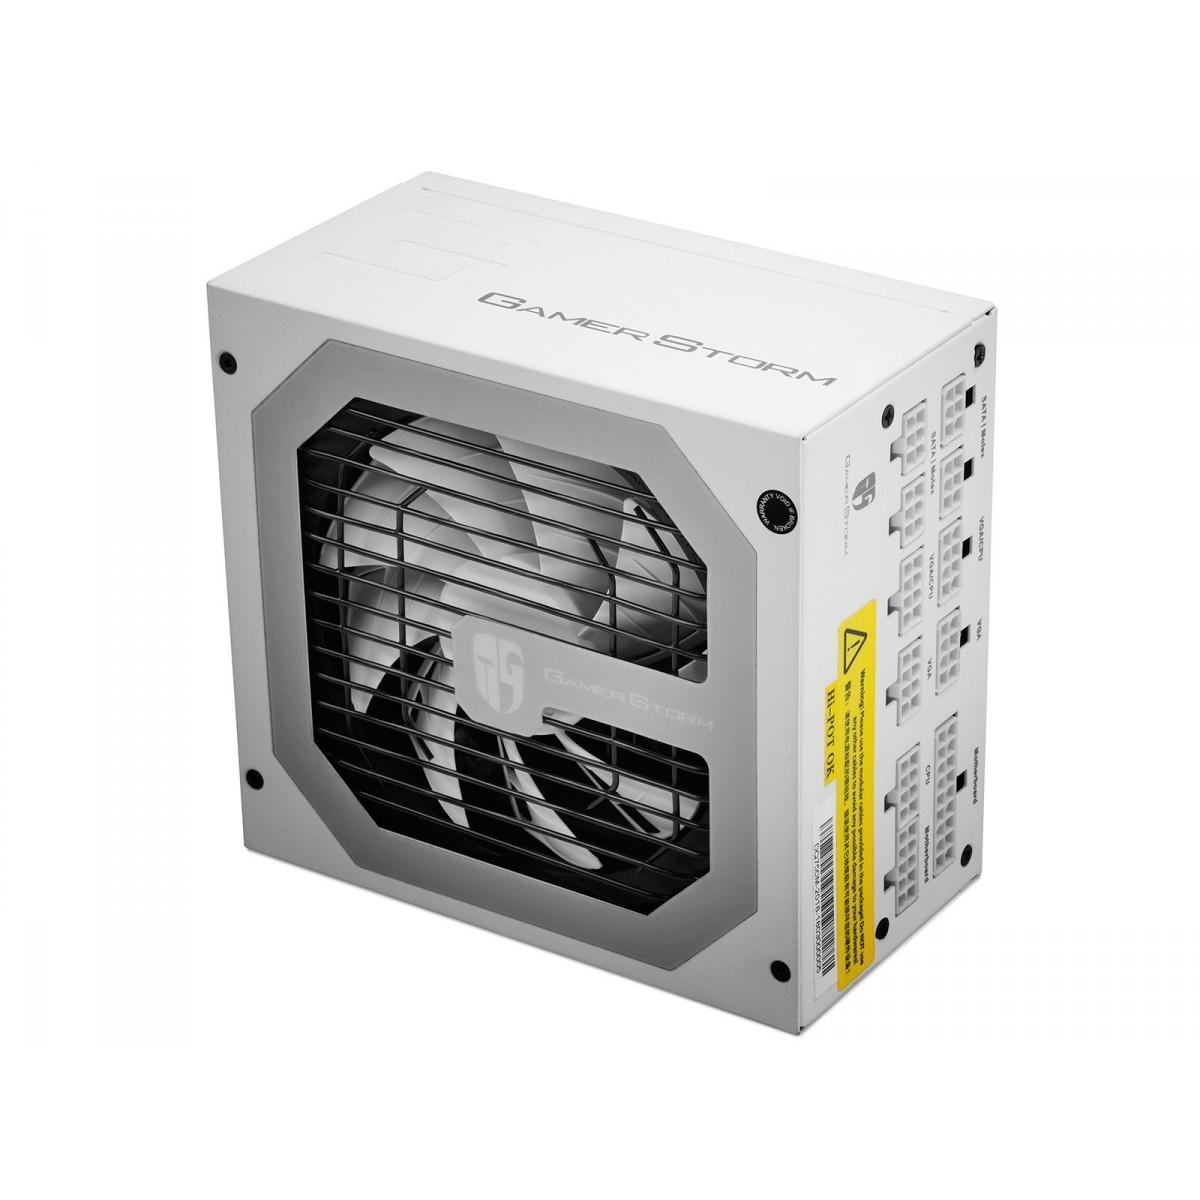 Fonte DeepCool GamerStorm DQ750M 750W, 80 Plus Gold, Modular, PFC Ativo, White